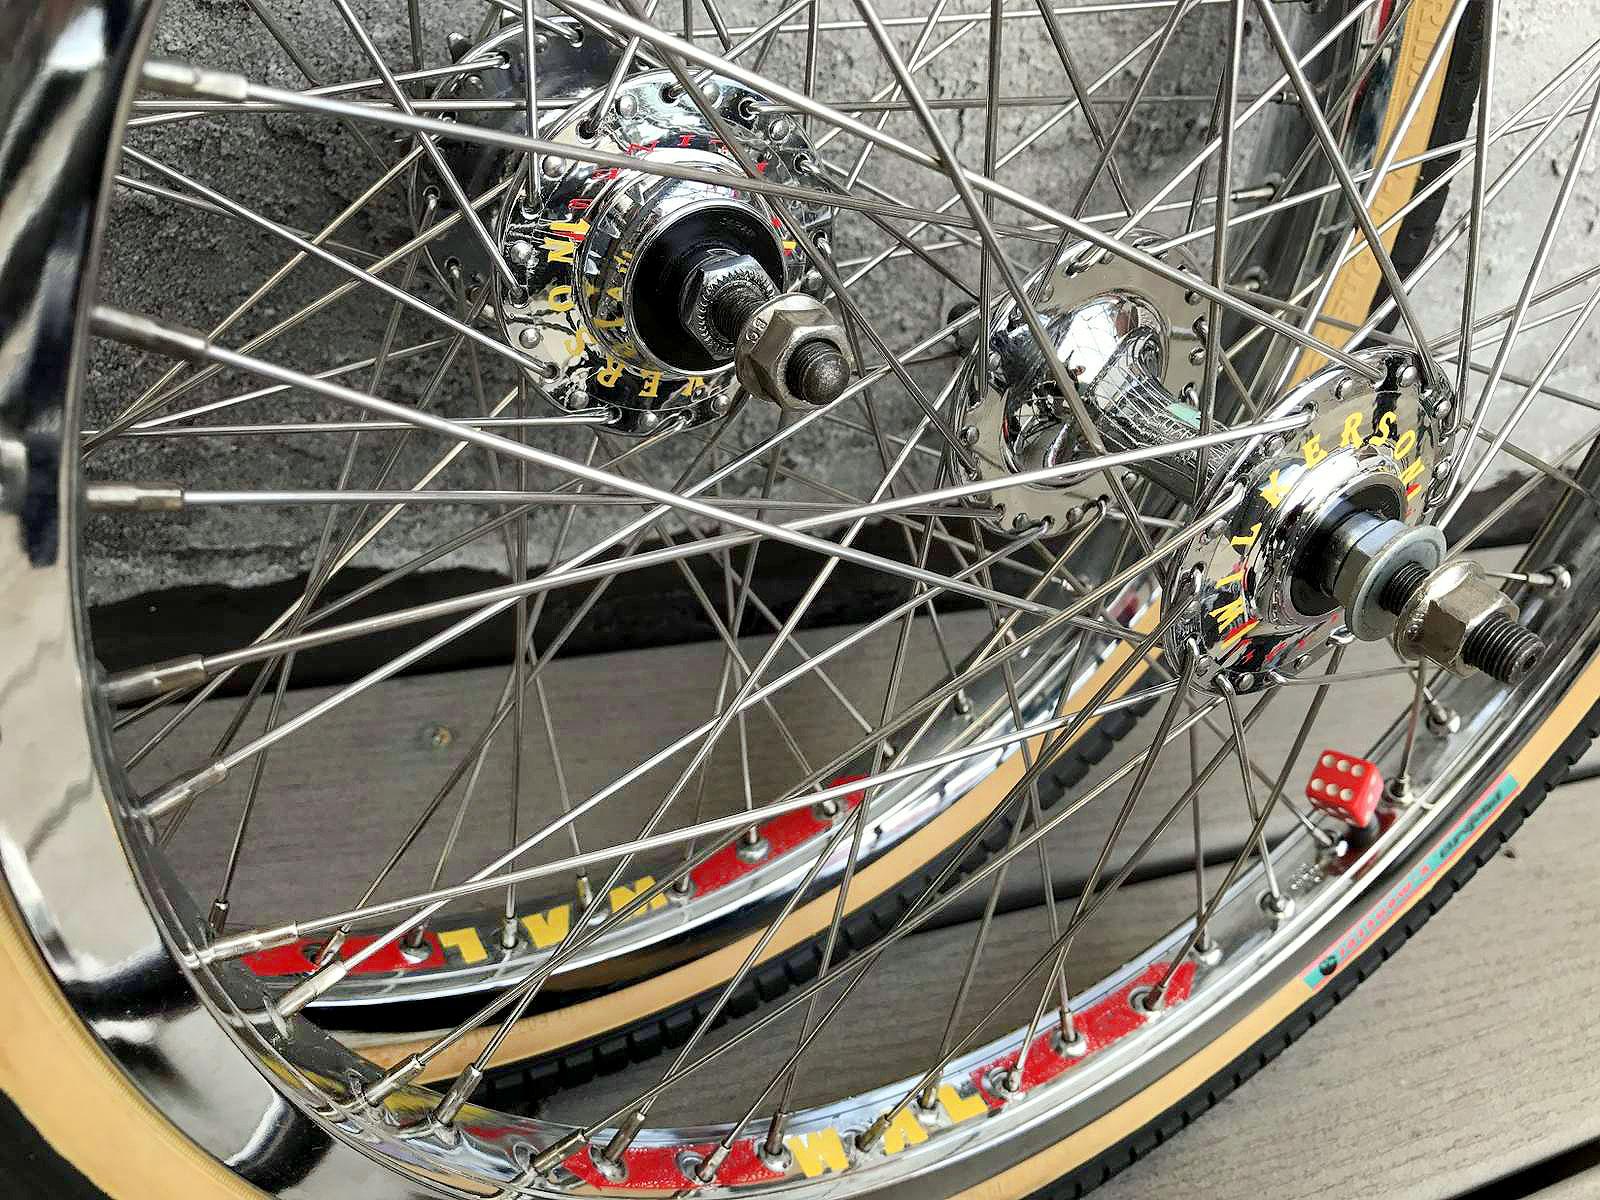 http://uploads.bmxmuseum.com/user-images/7439/wal_build_wheels591ce67d6e.jpg